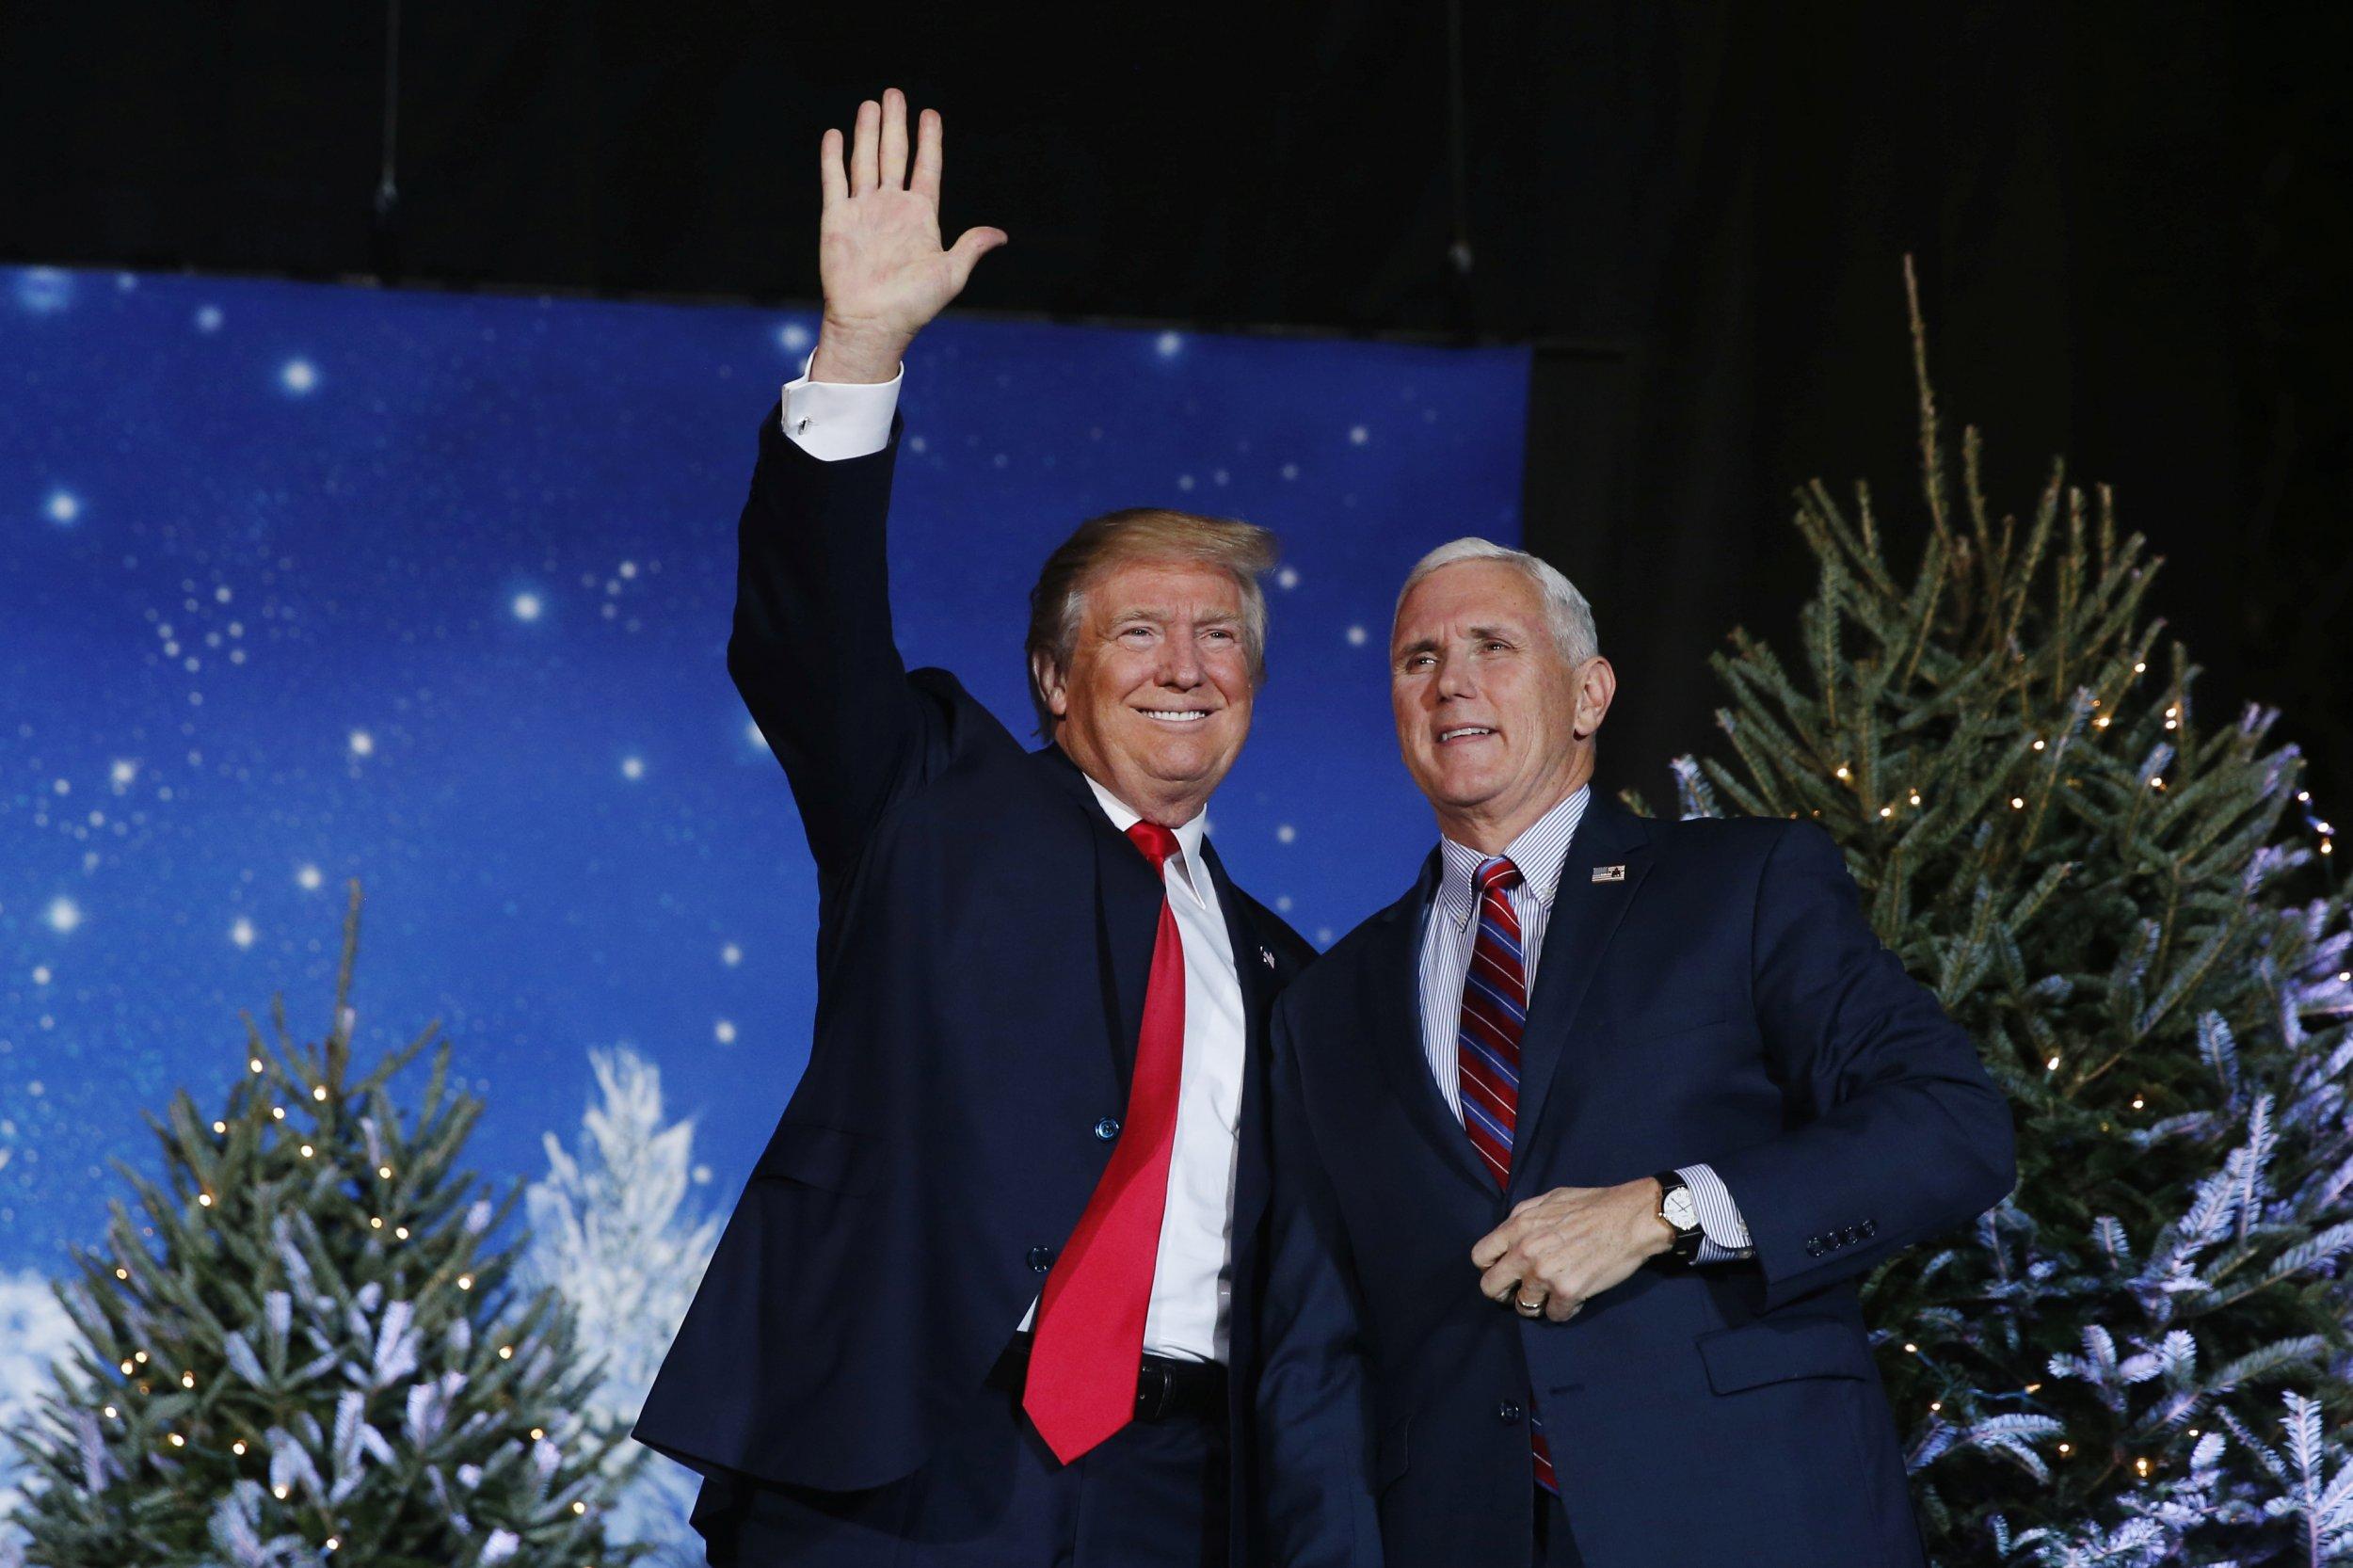 0109_Donald_Trump_inauguration_01